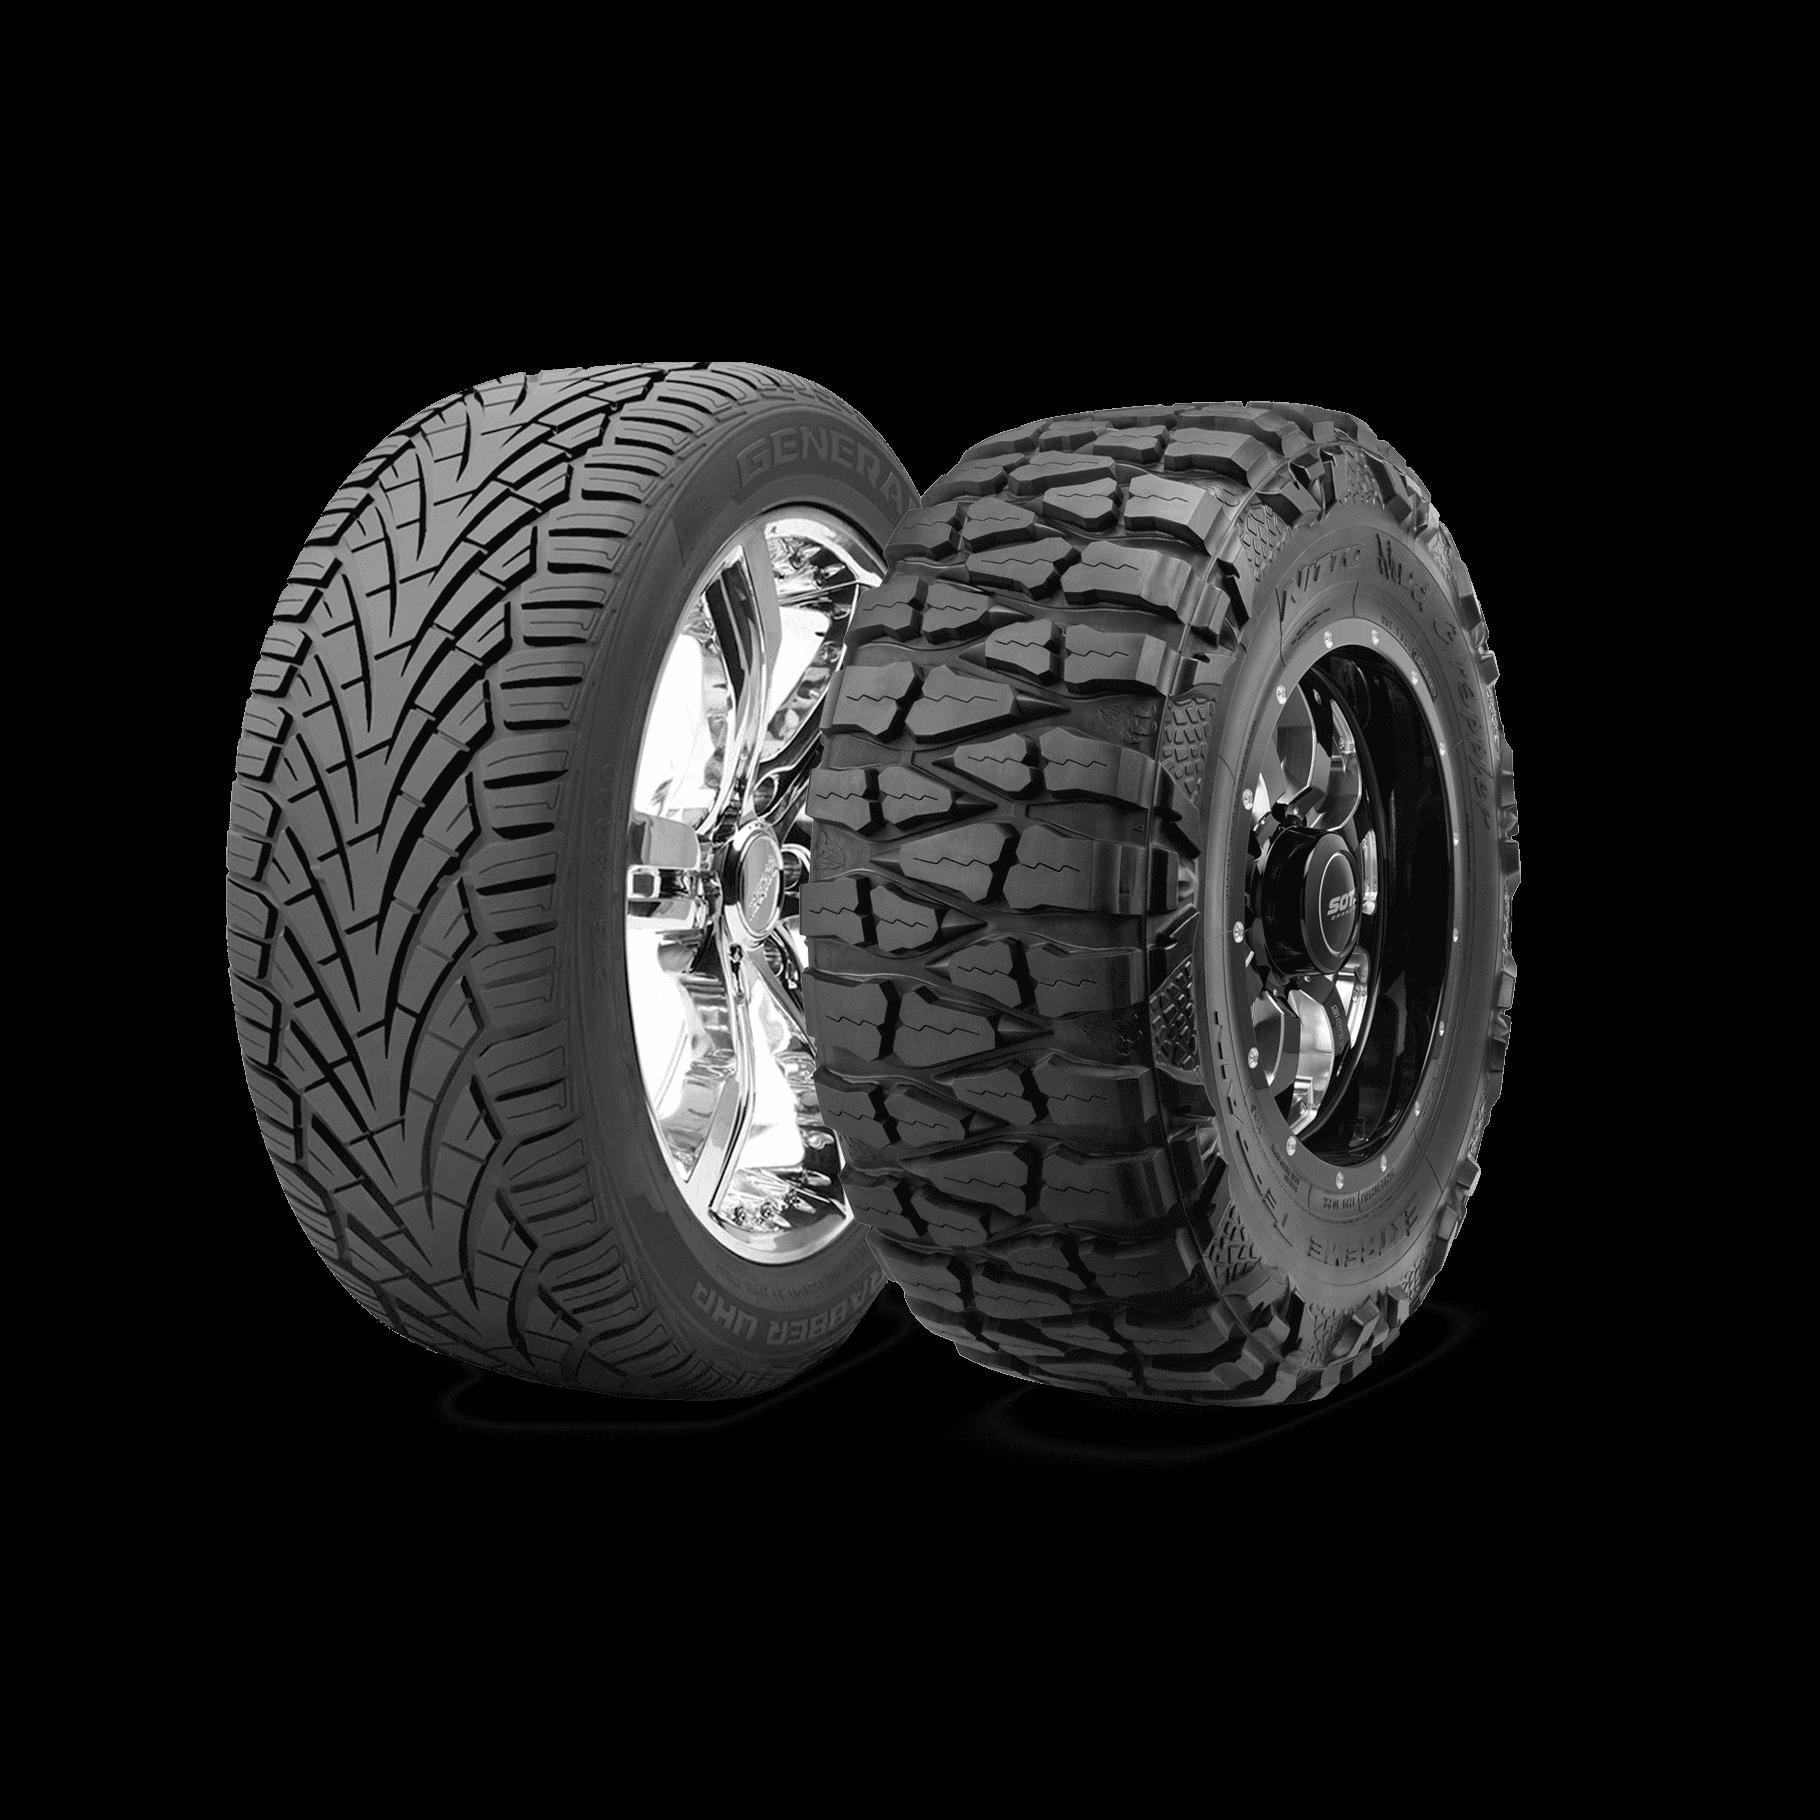 Buy Tires Online >> Tirebuyer Com Deals And Discounts Npp